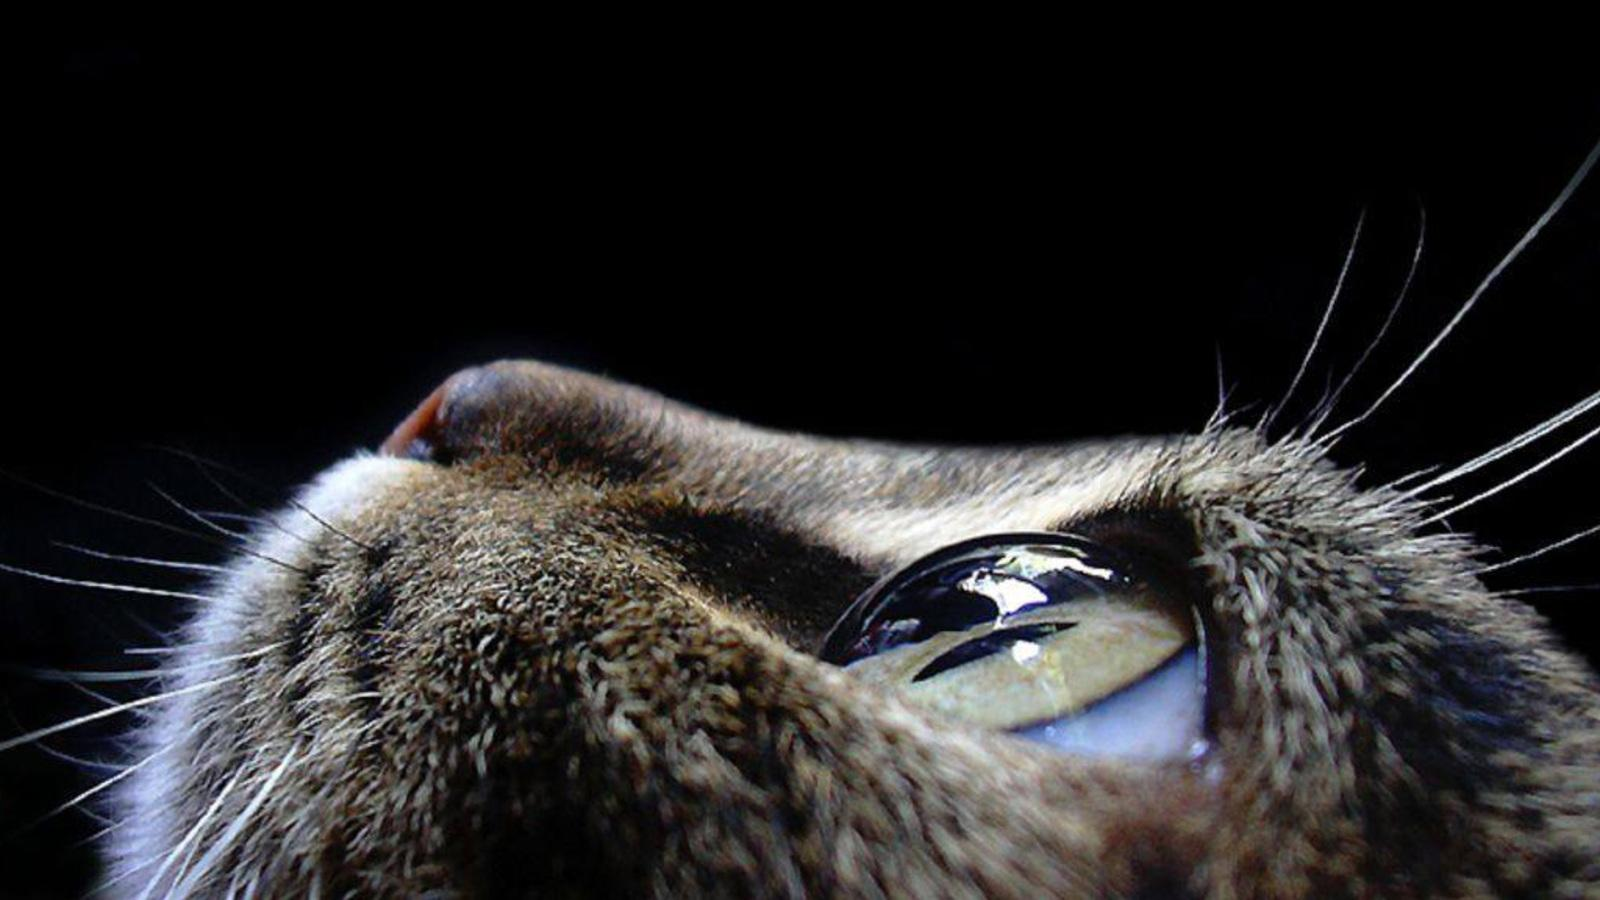 cats eye HD Wallpaper